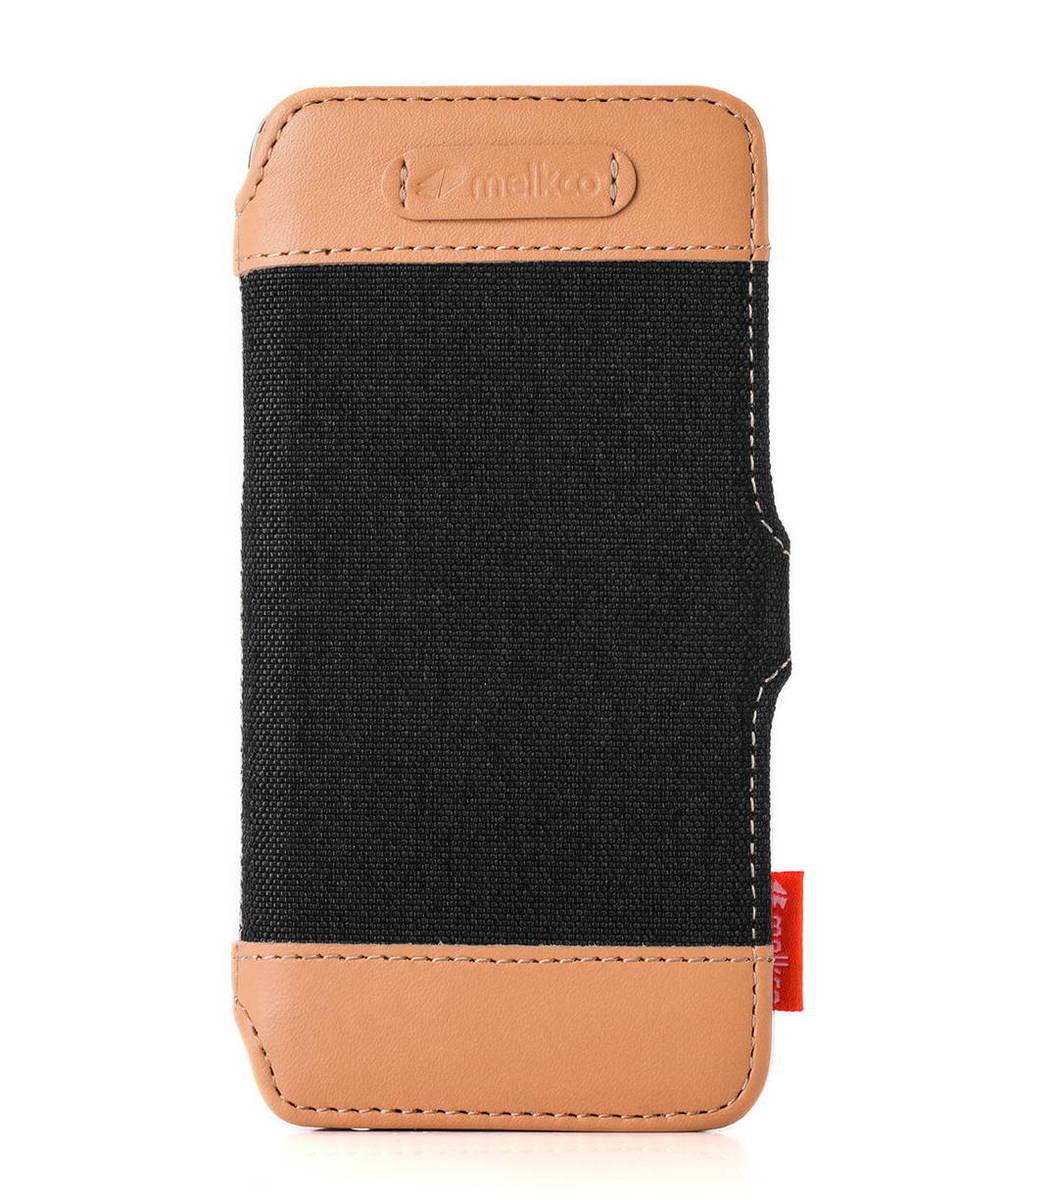 "Apple Iphone 6 Plus/6s Plus (5.5"") Booka Style Cru系列高級時尚真皮手機套(黑色)"